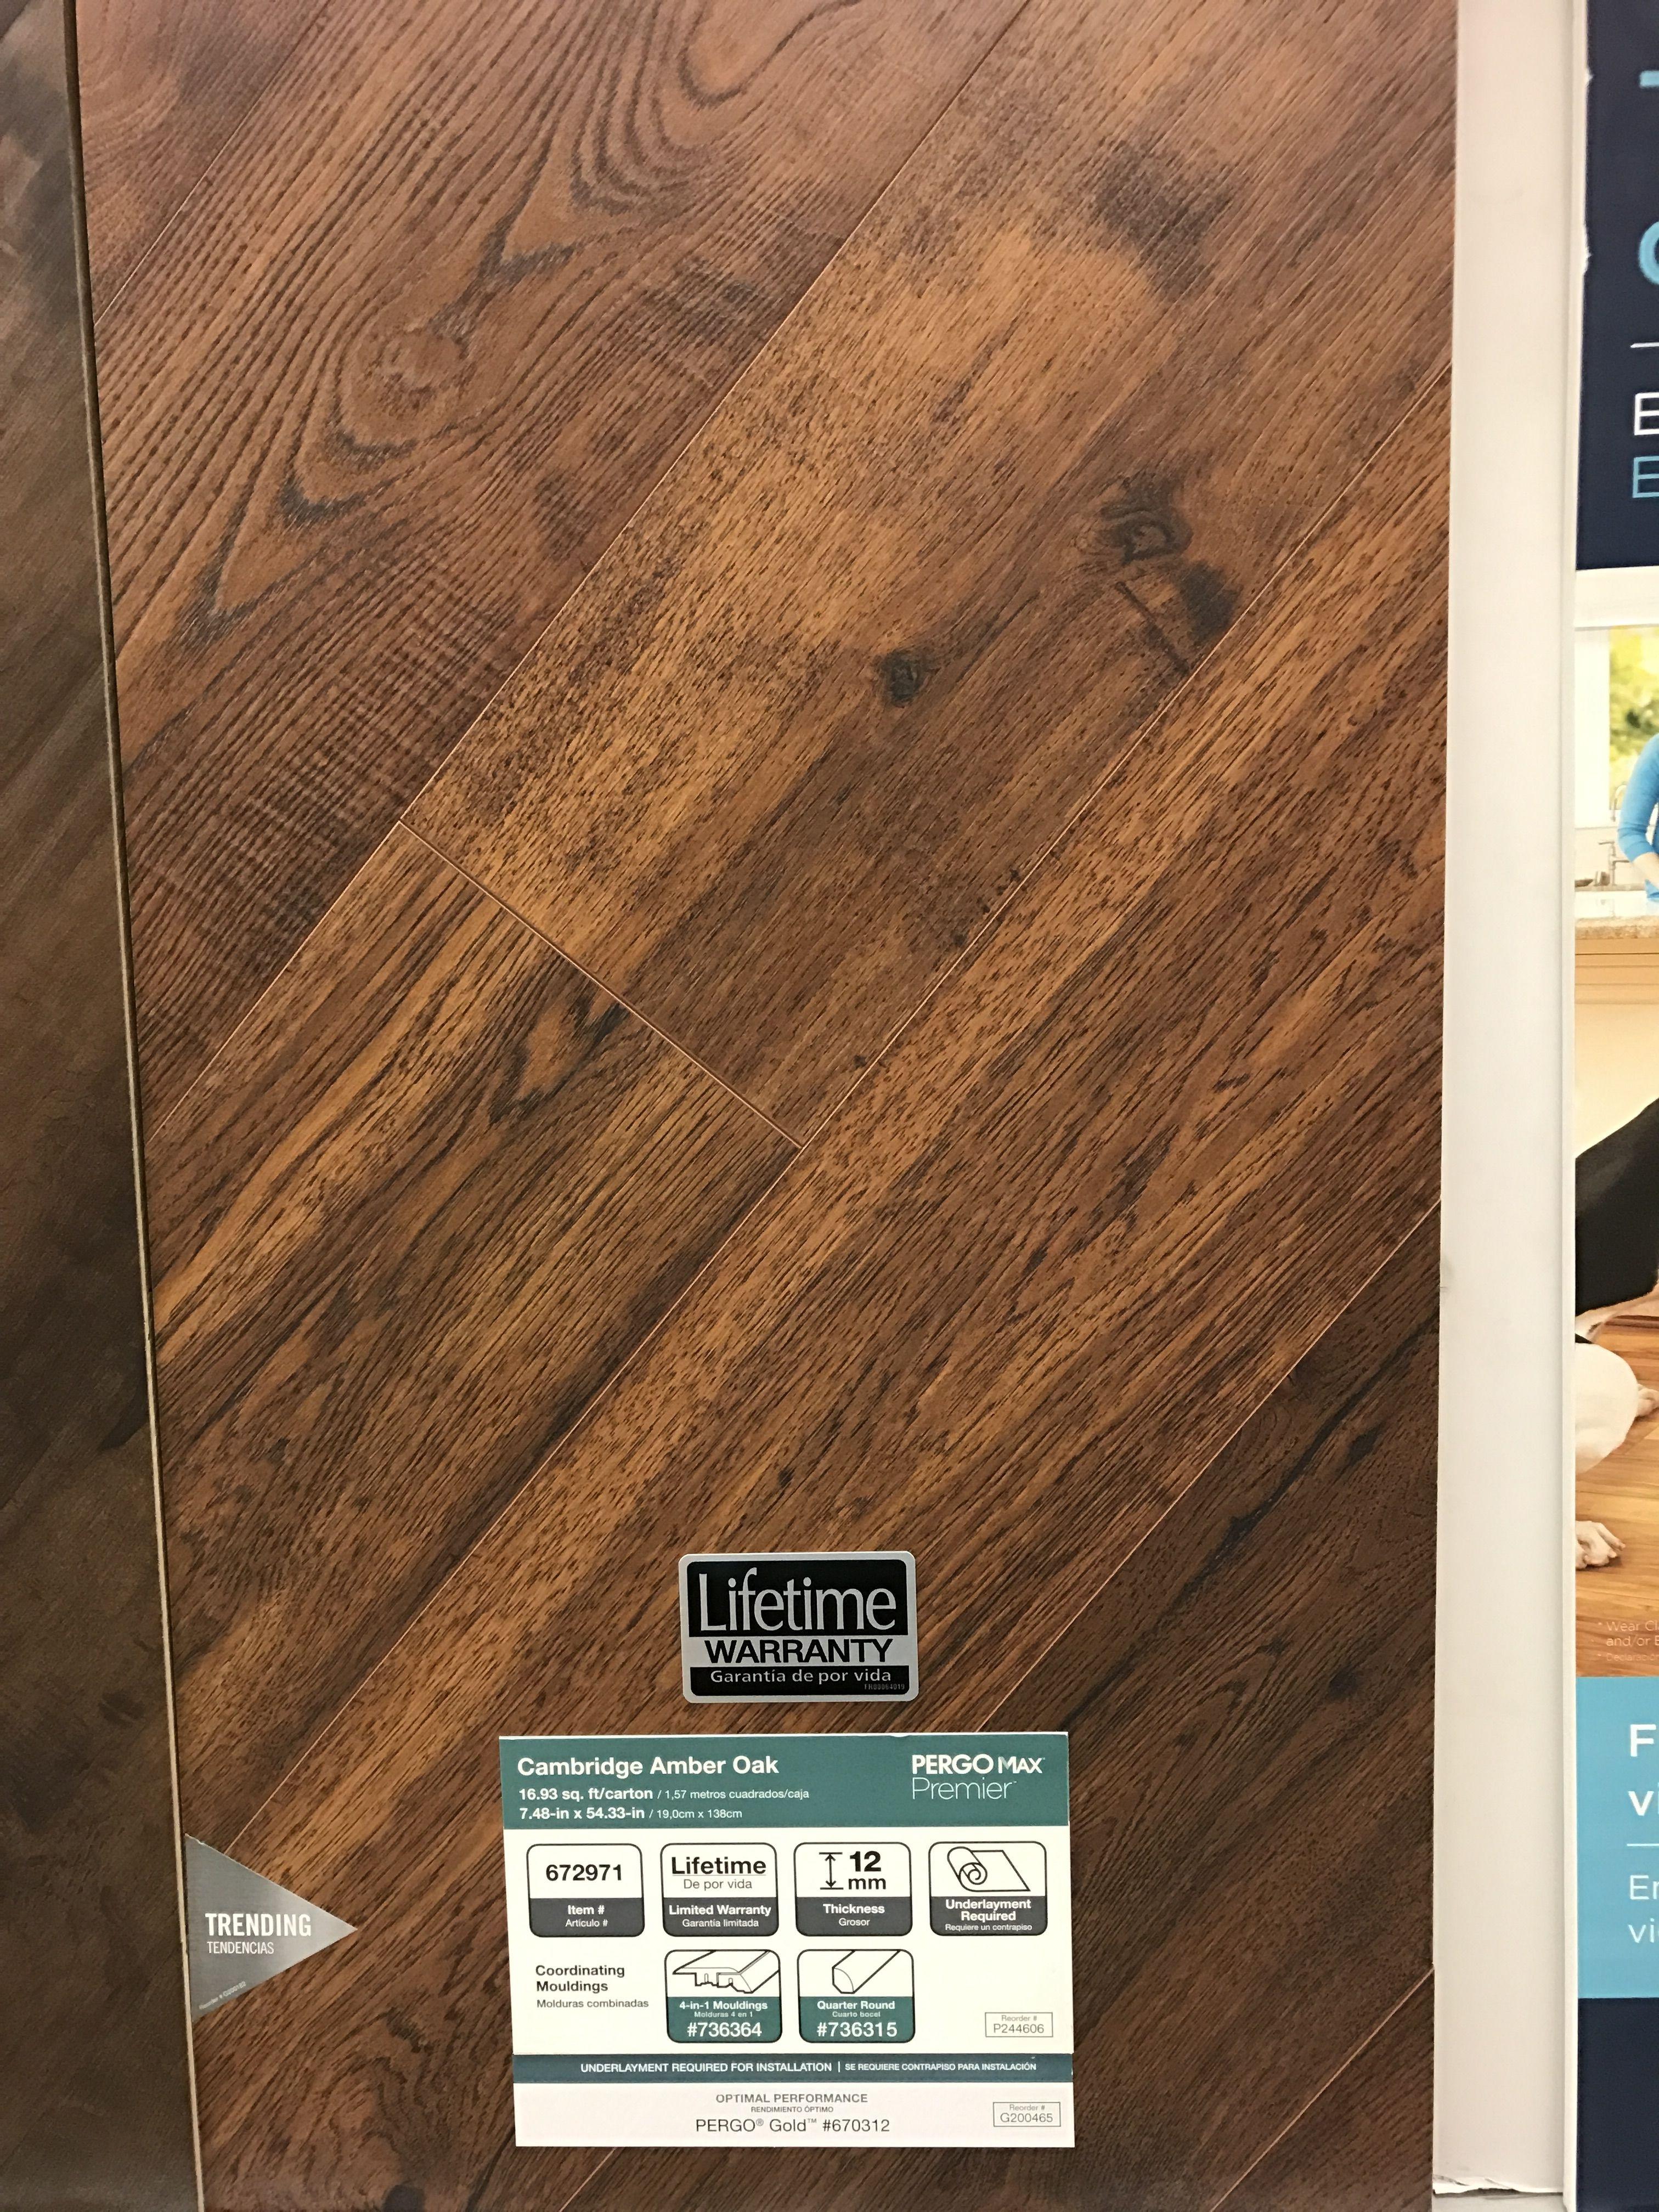 mm hardwood floors of premier laminate flooring fresh piedmont oak is a versatile warm with regard to premier laminate flooring elegant pergo max premier cambridge amber oak home pinterest collection of premier laminate